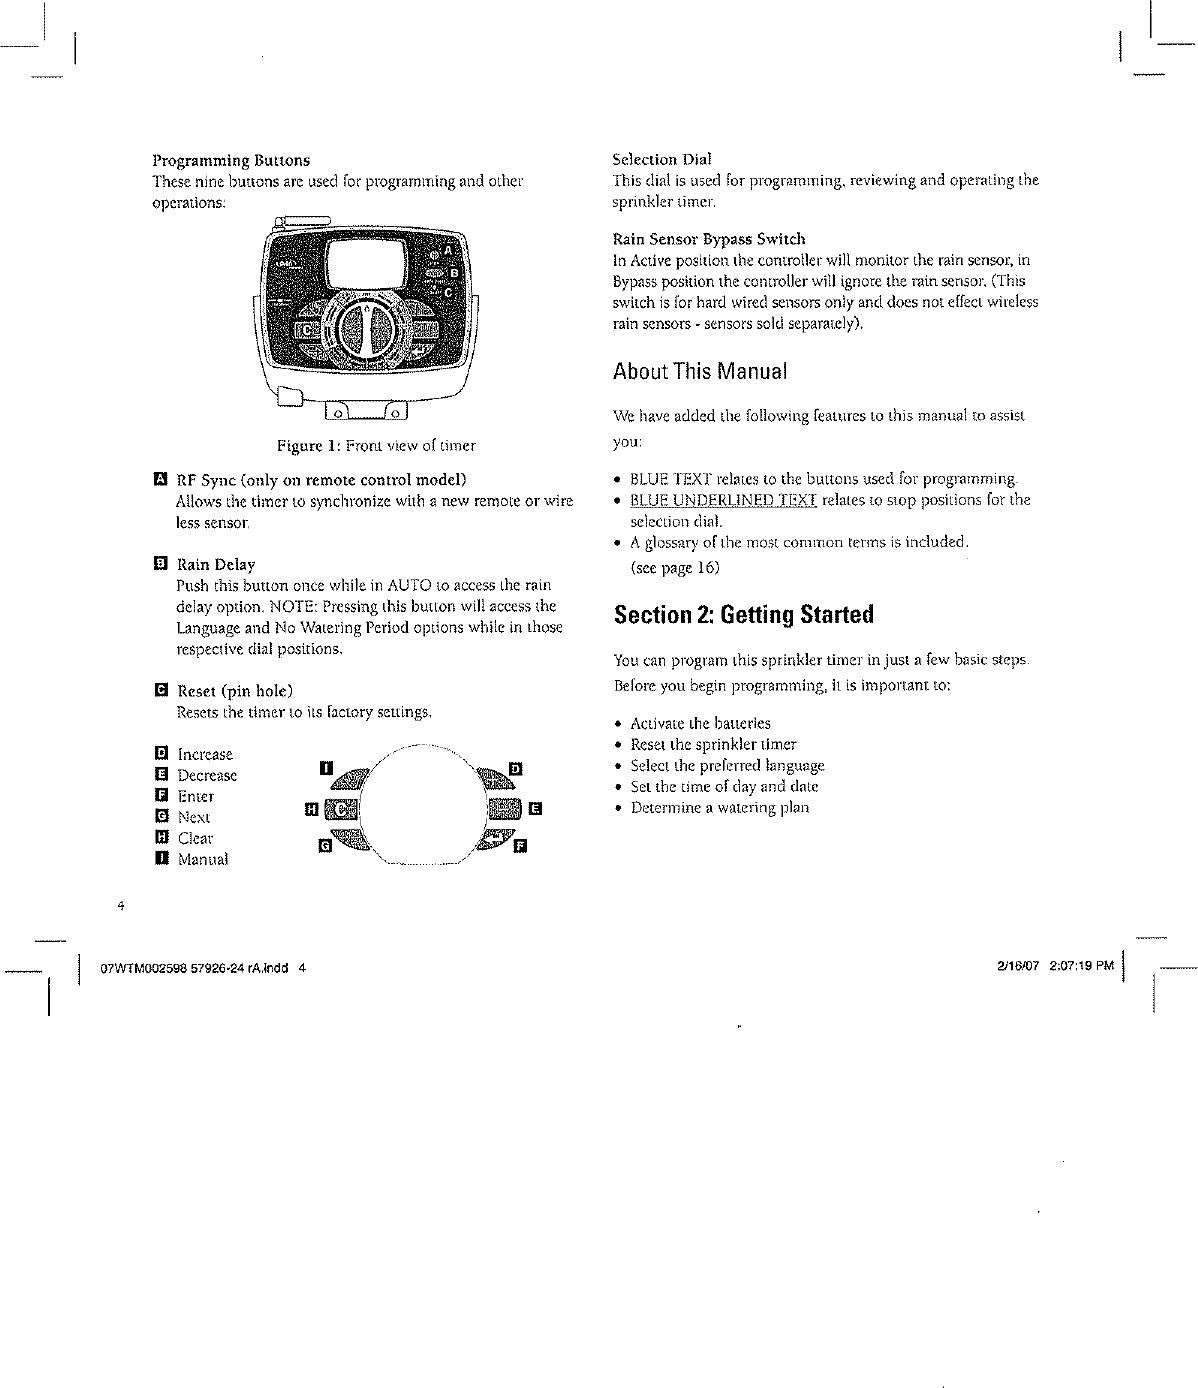 Orbit Pump Relay Manual In 2020 Sprinkler Timer Relay Water Timer